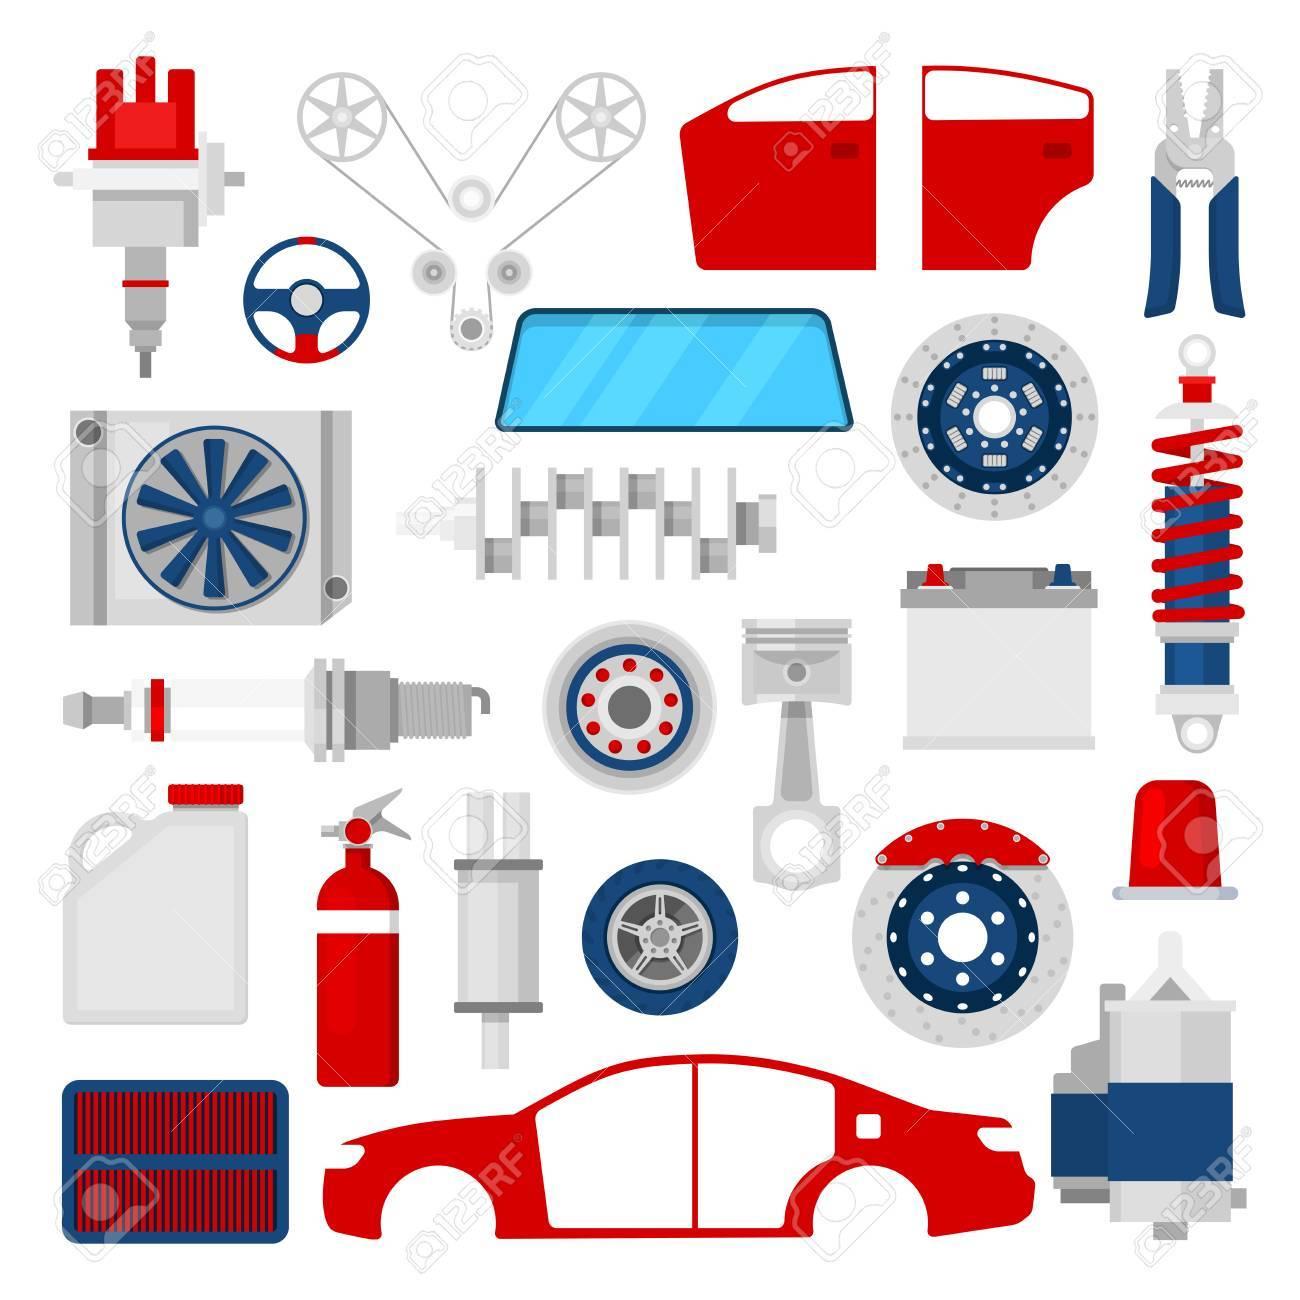 Car Parts Stock Illustrations, Cliparts And Royalty Free Car Parts Vectors